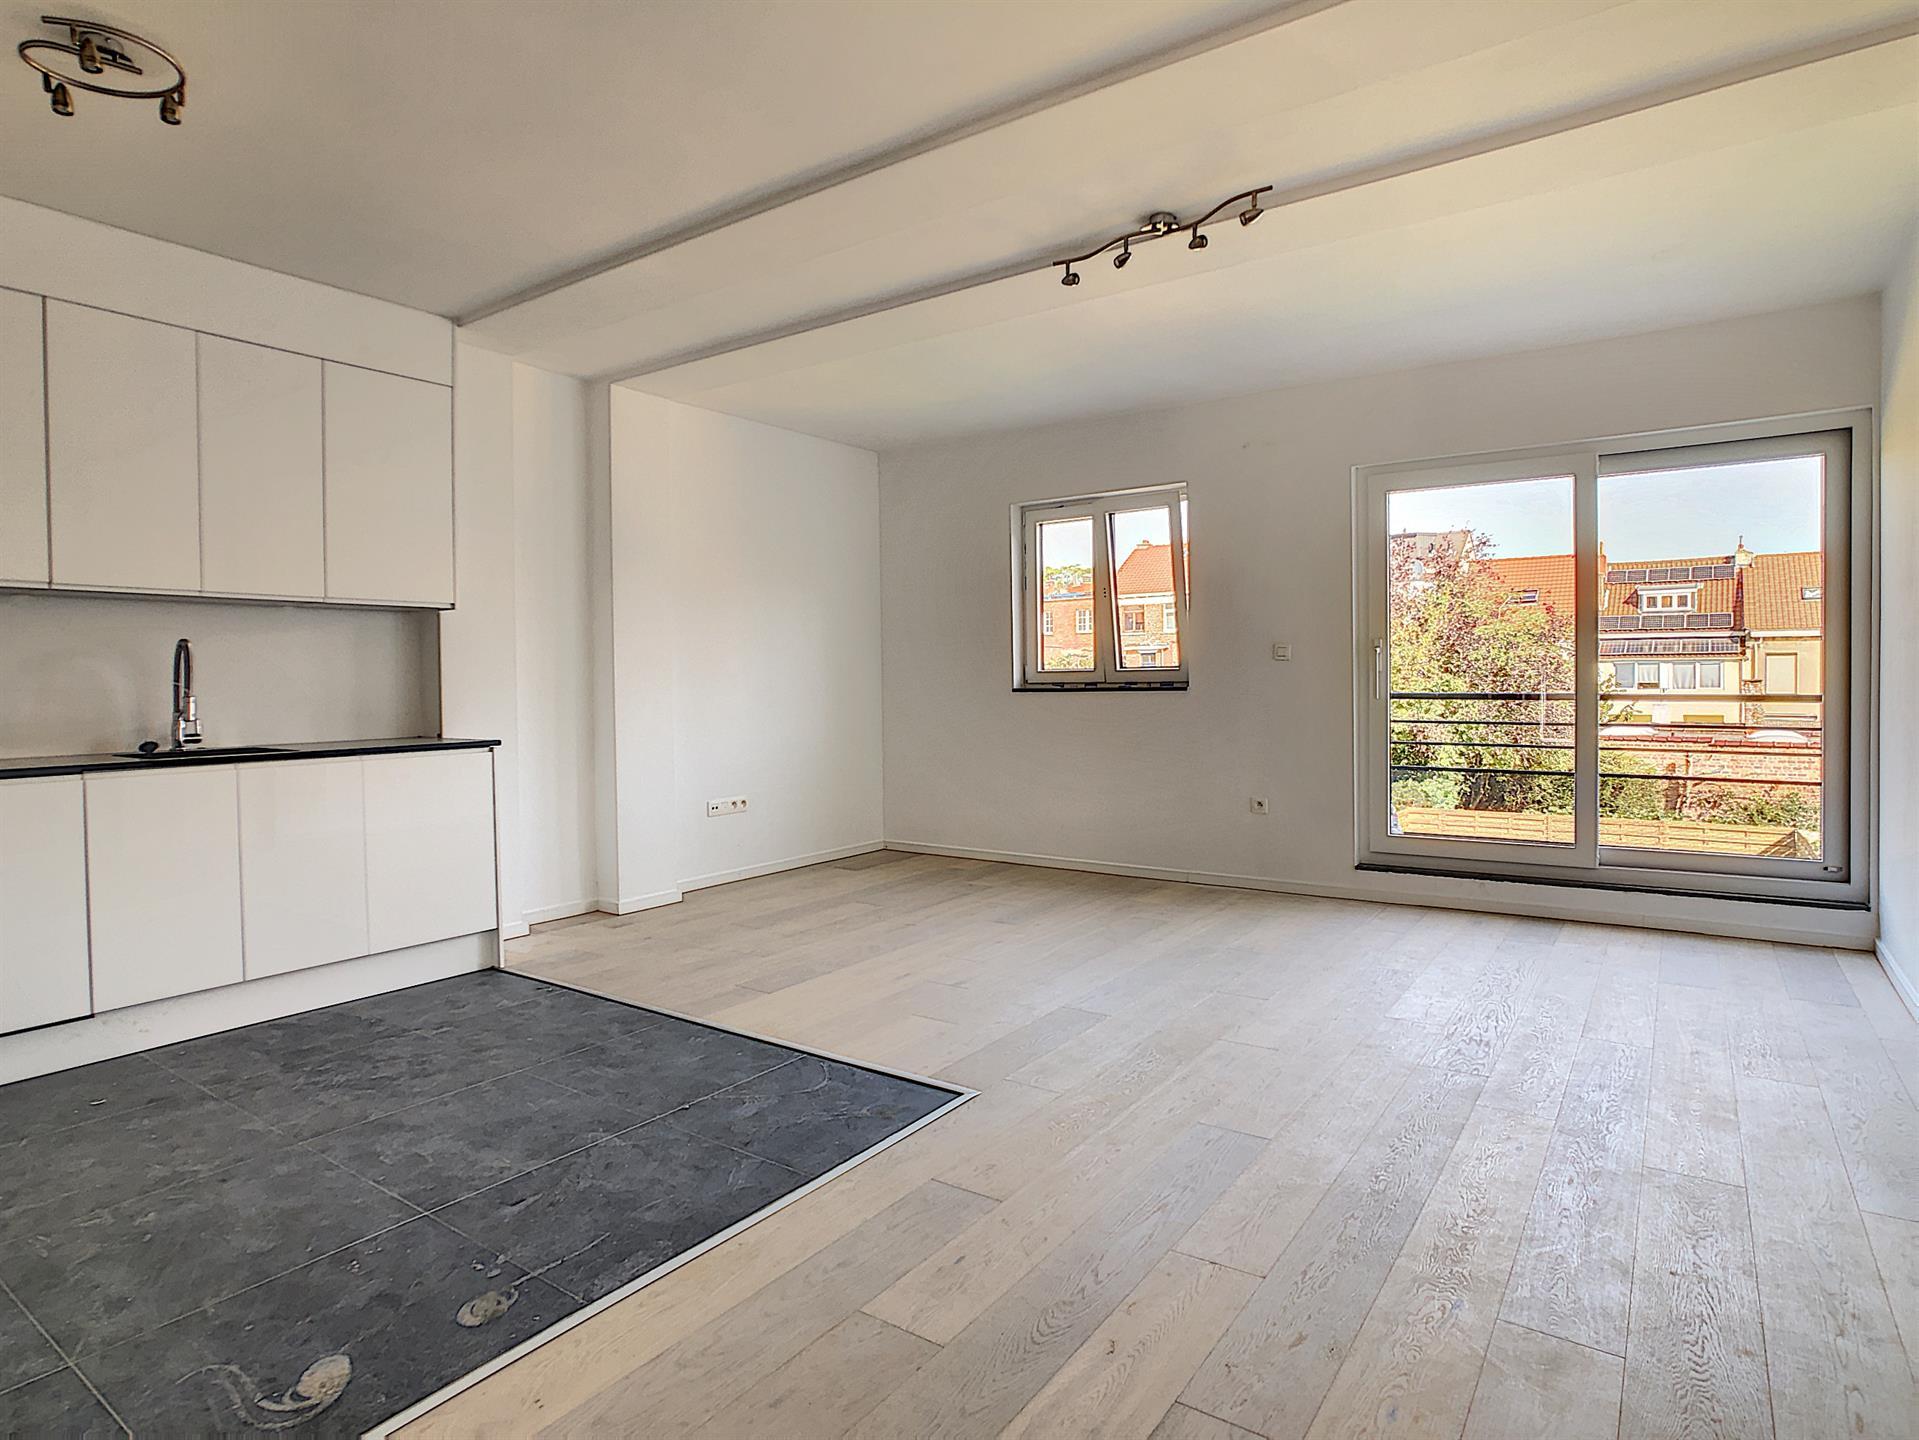 Appartement - Anderlecht - #4252376-13